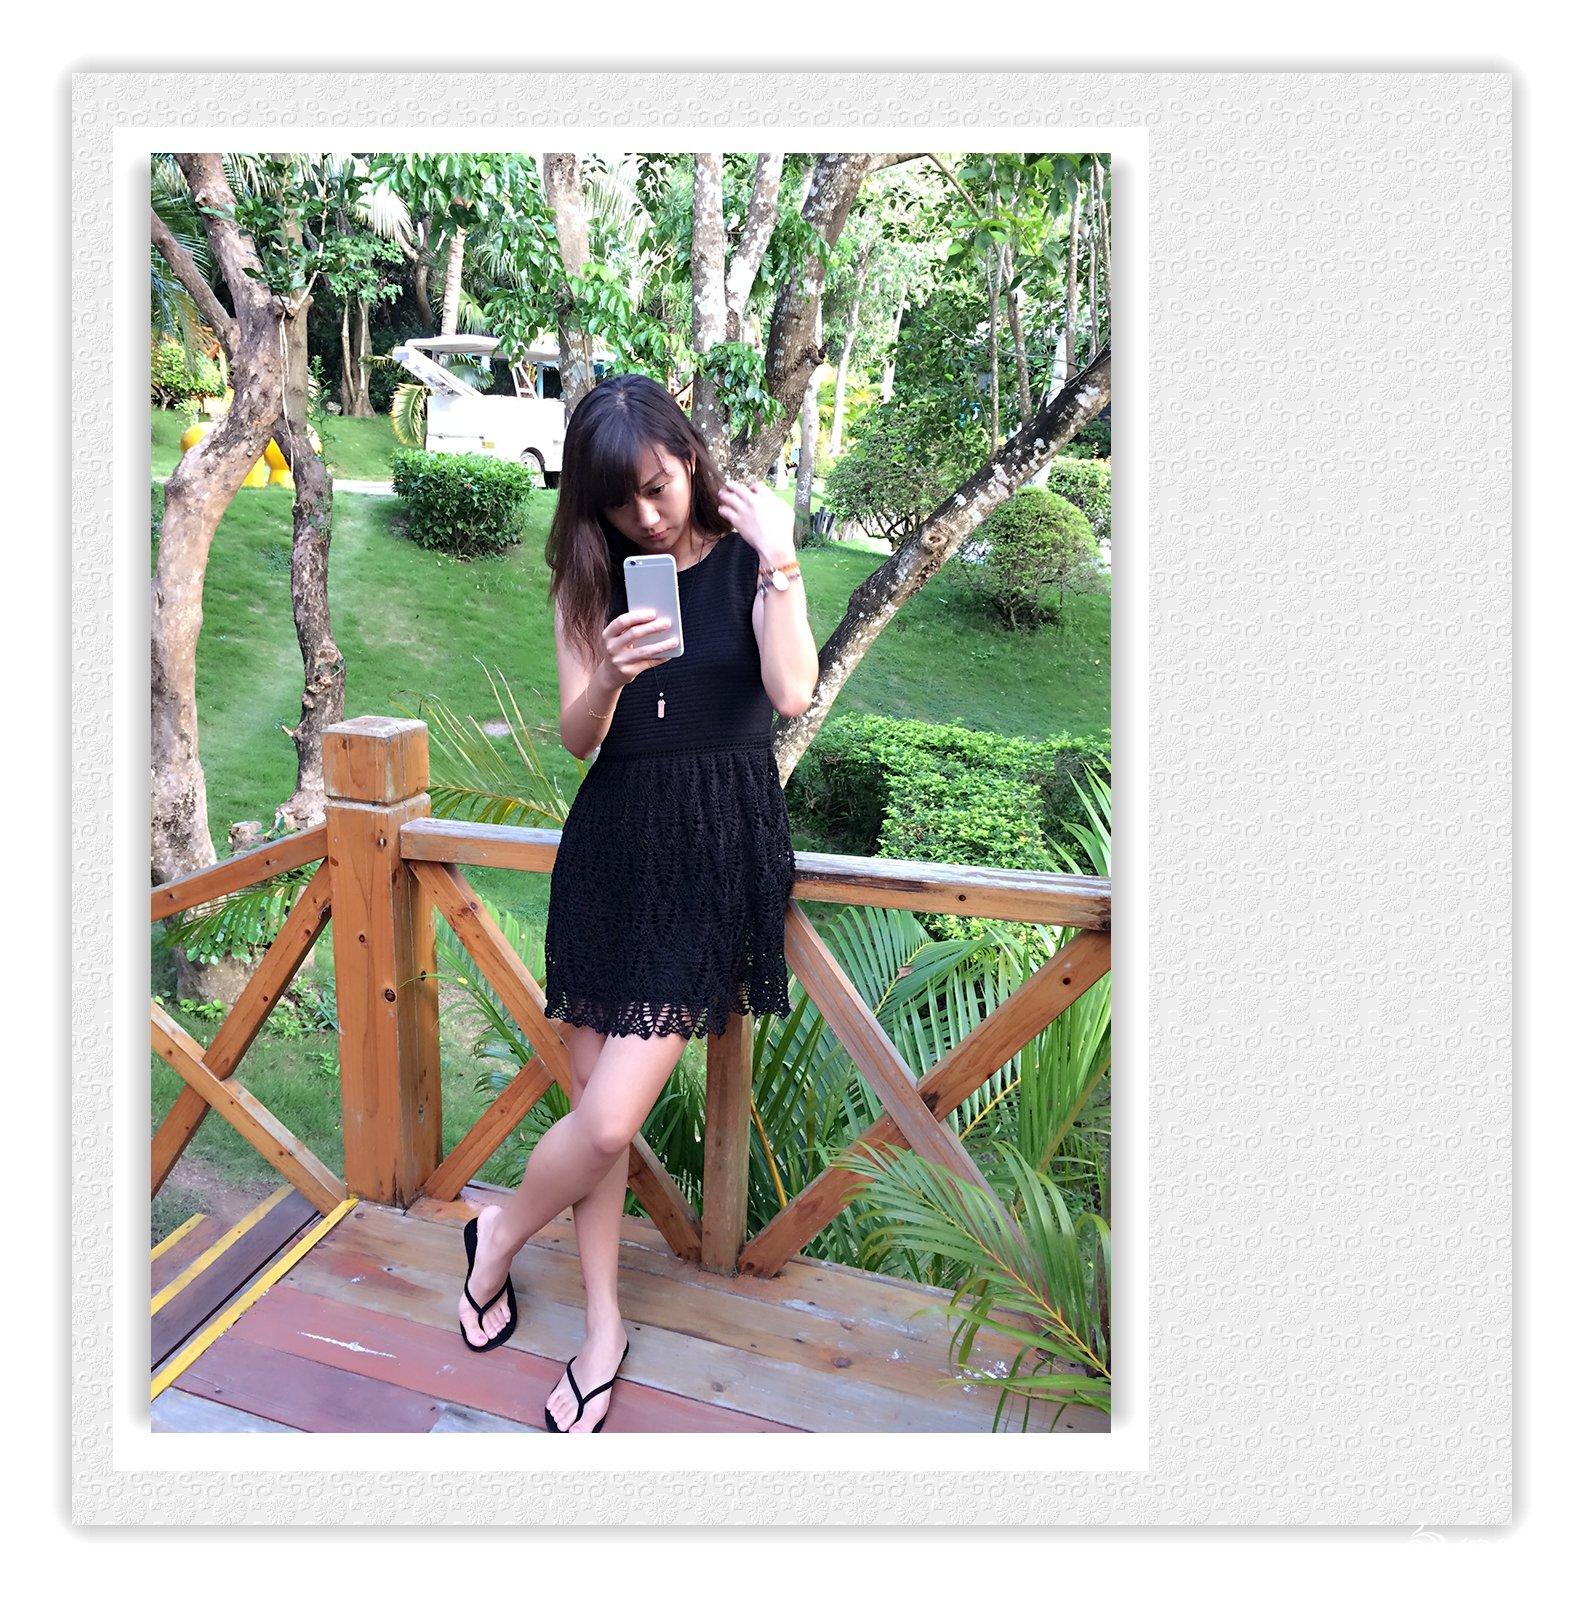 PIC_20150803_174612_0E2.jpg